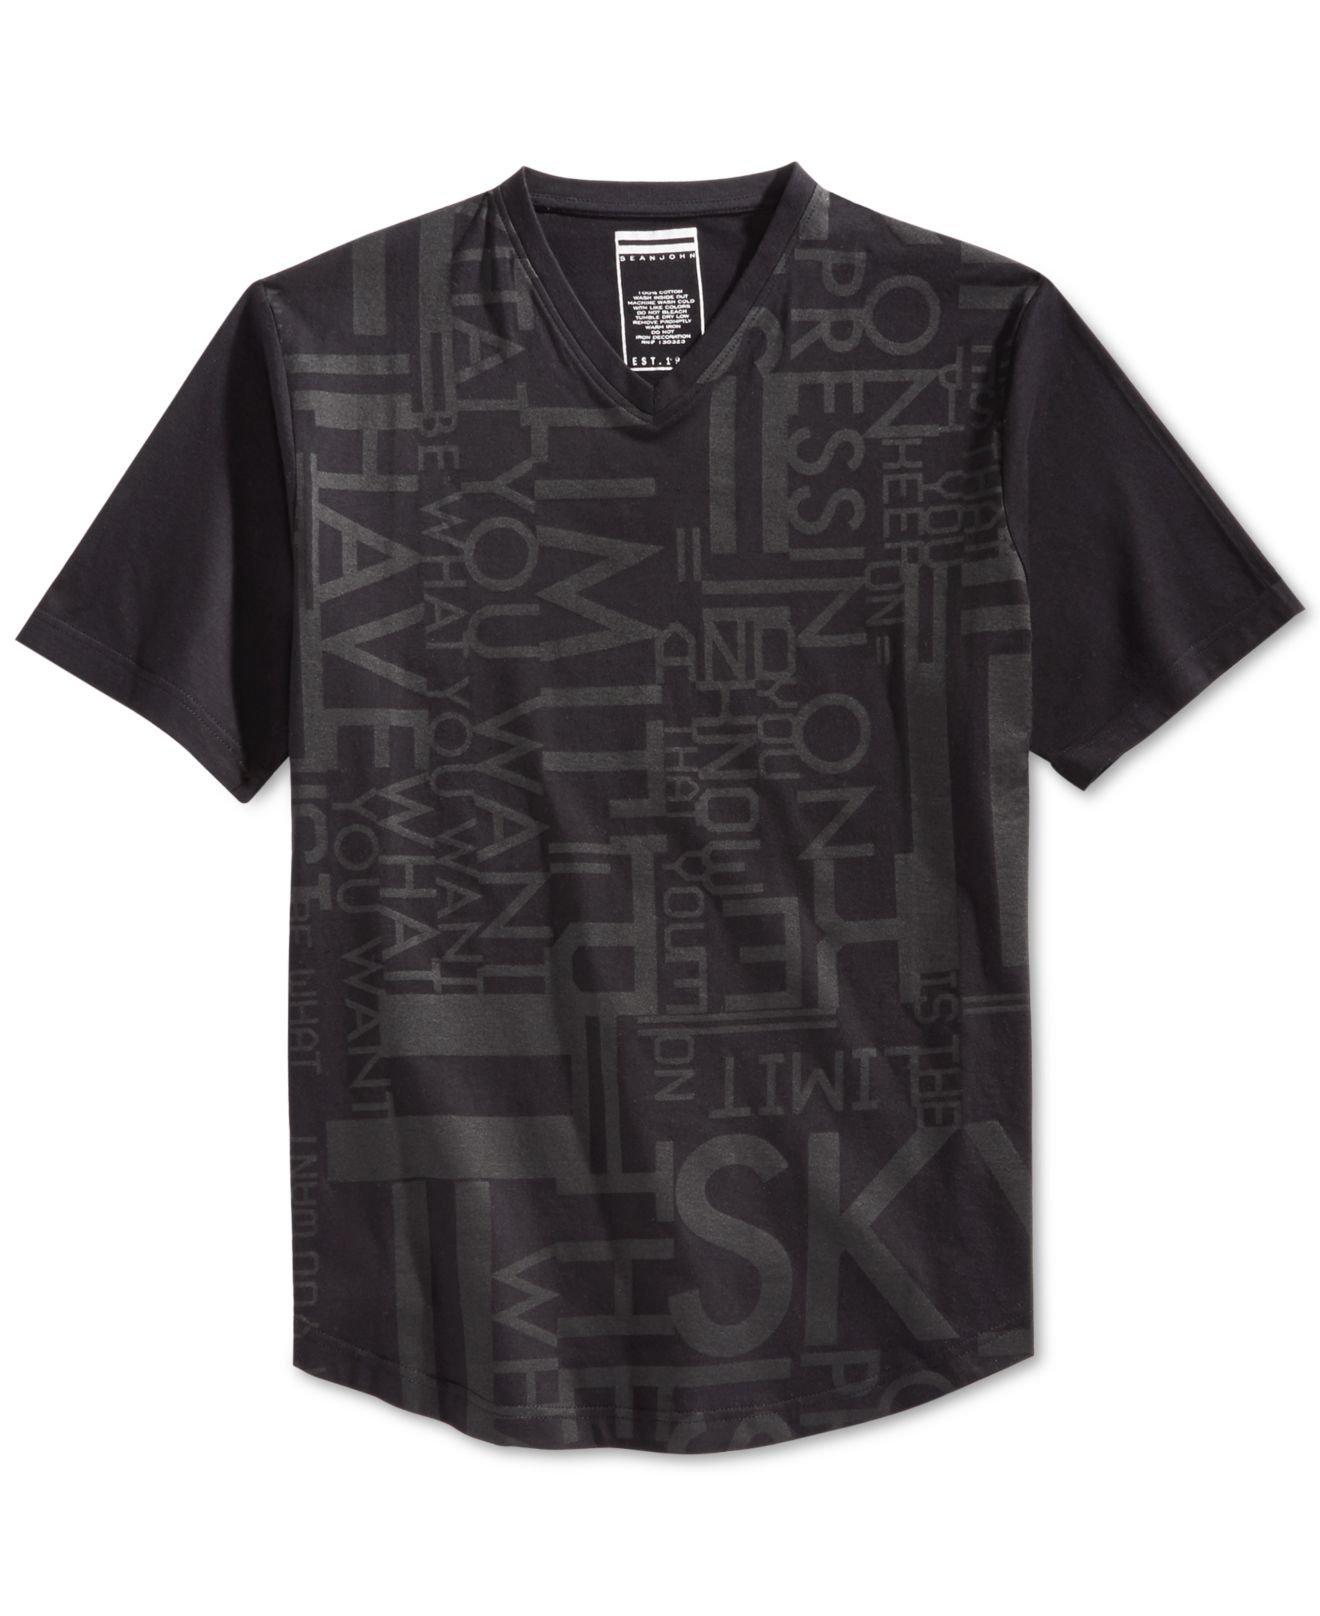 Sean john men 39 s sky is the limit t shirt in black for men for Sean john t shirts for mens